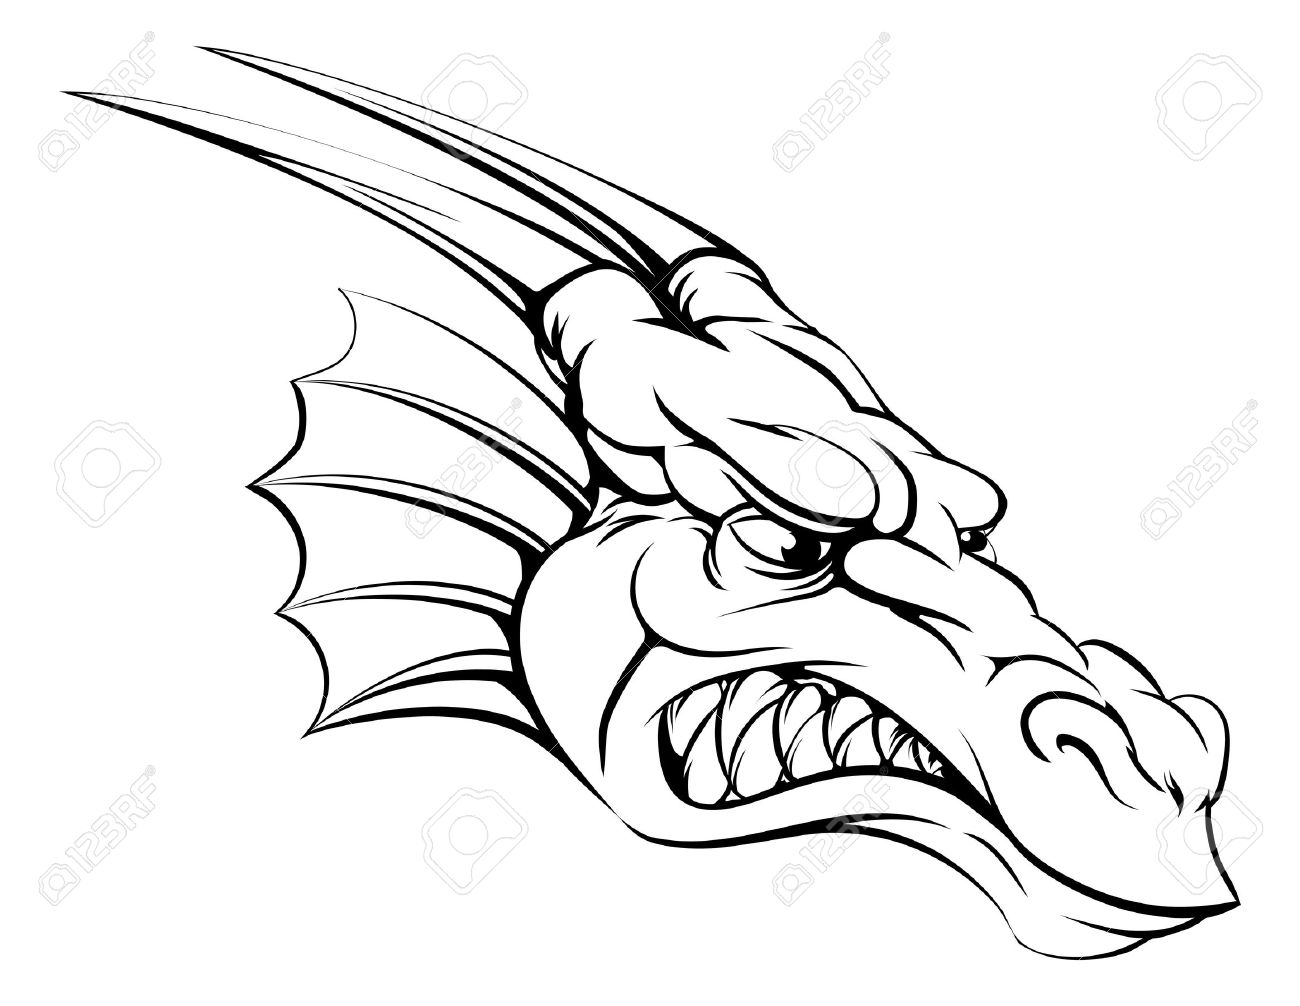 1300x1006 A Drawing Of A Mean Tough Dragon Mascot Head Ilustraciones